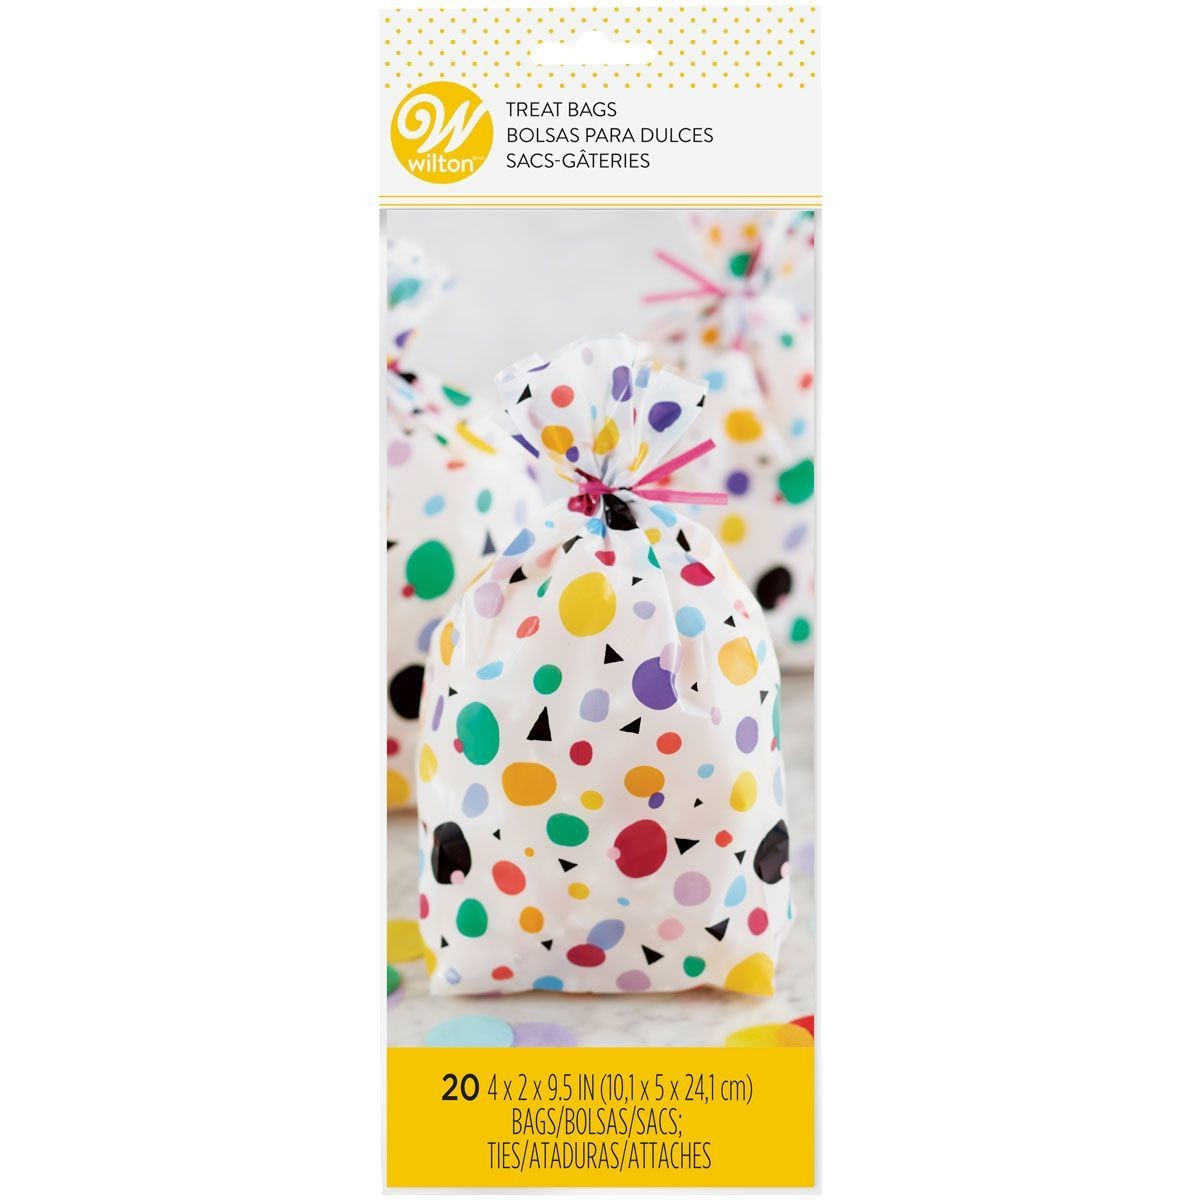 Wilton Treat Bags -MAX DOTS TRIANGLES - 20τεμ Σακουλάκια με συρματάκια πουά για γλυκά & ζαχαρωτά